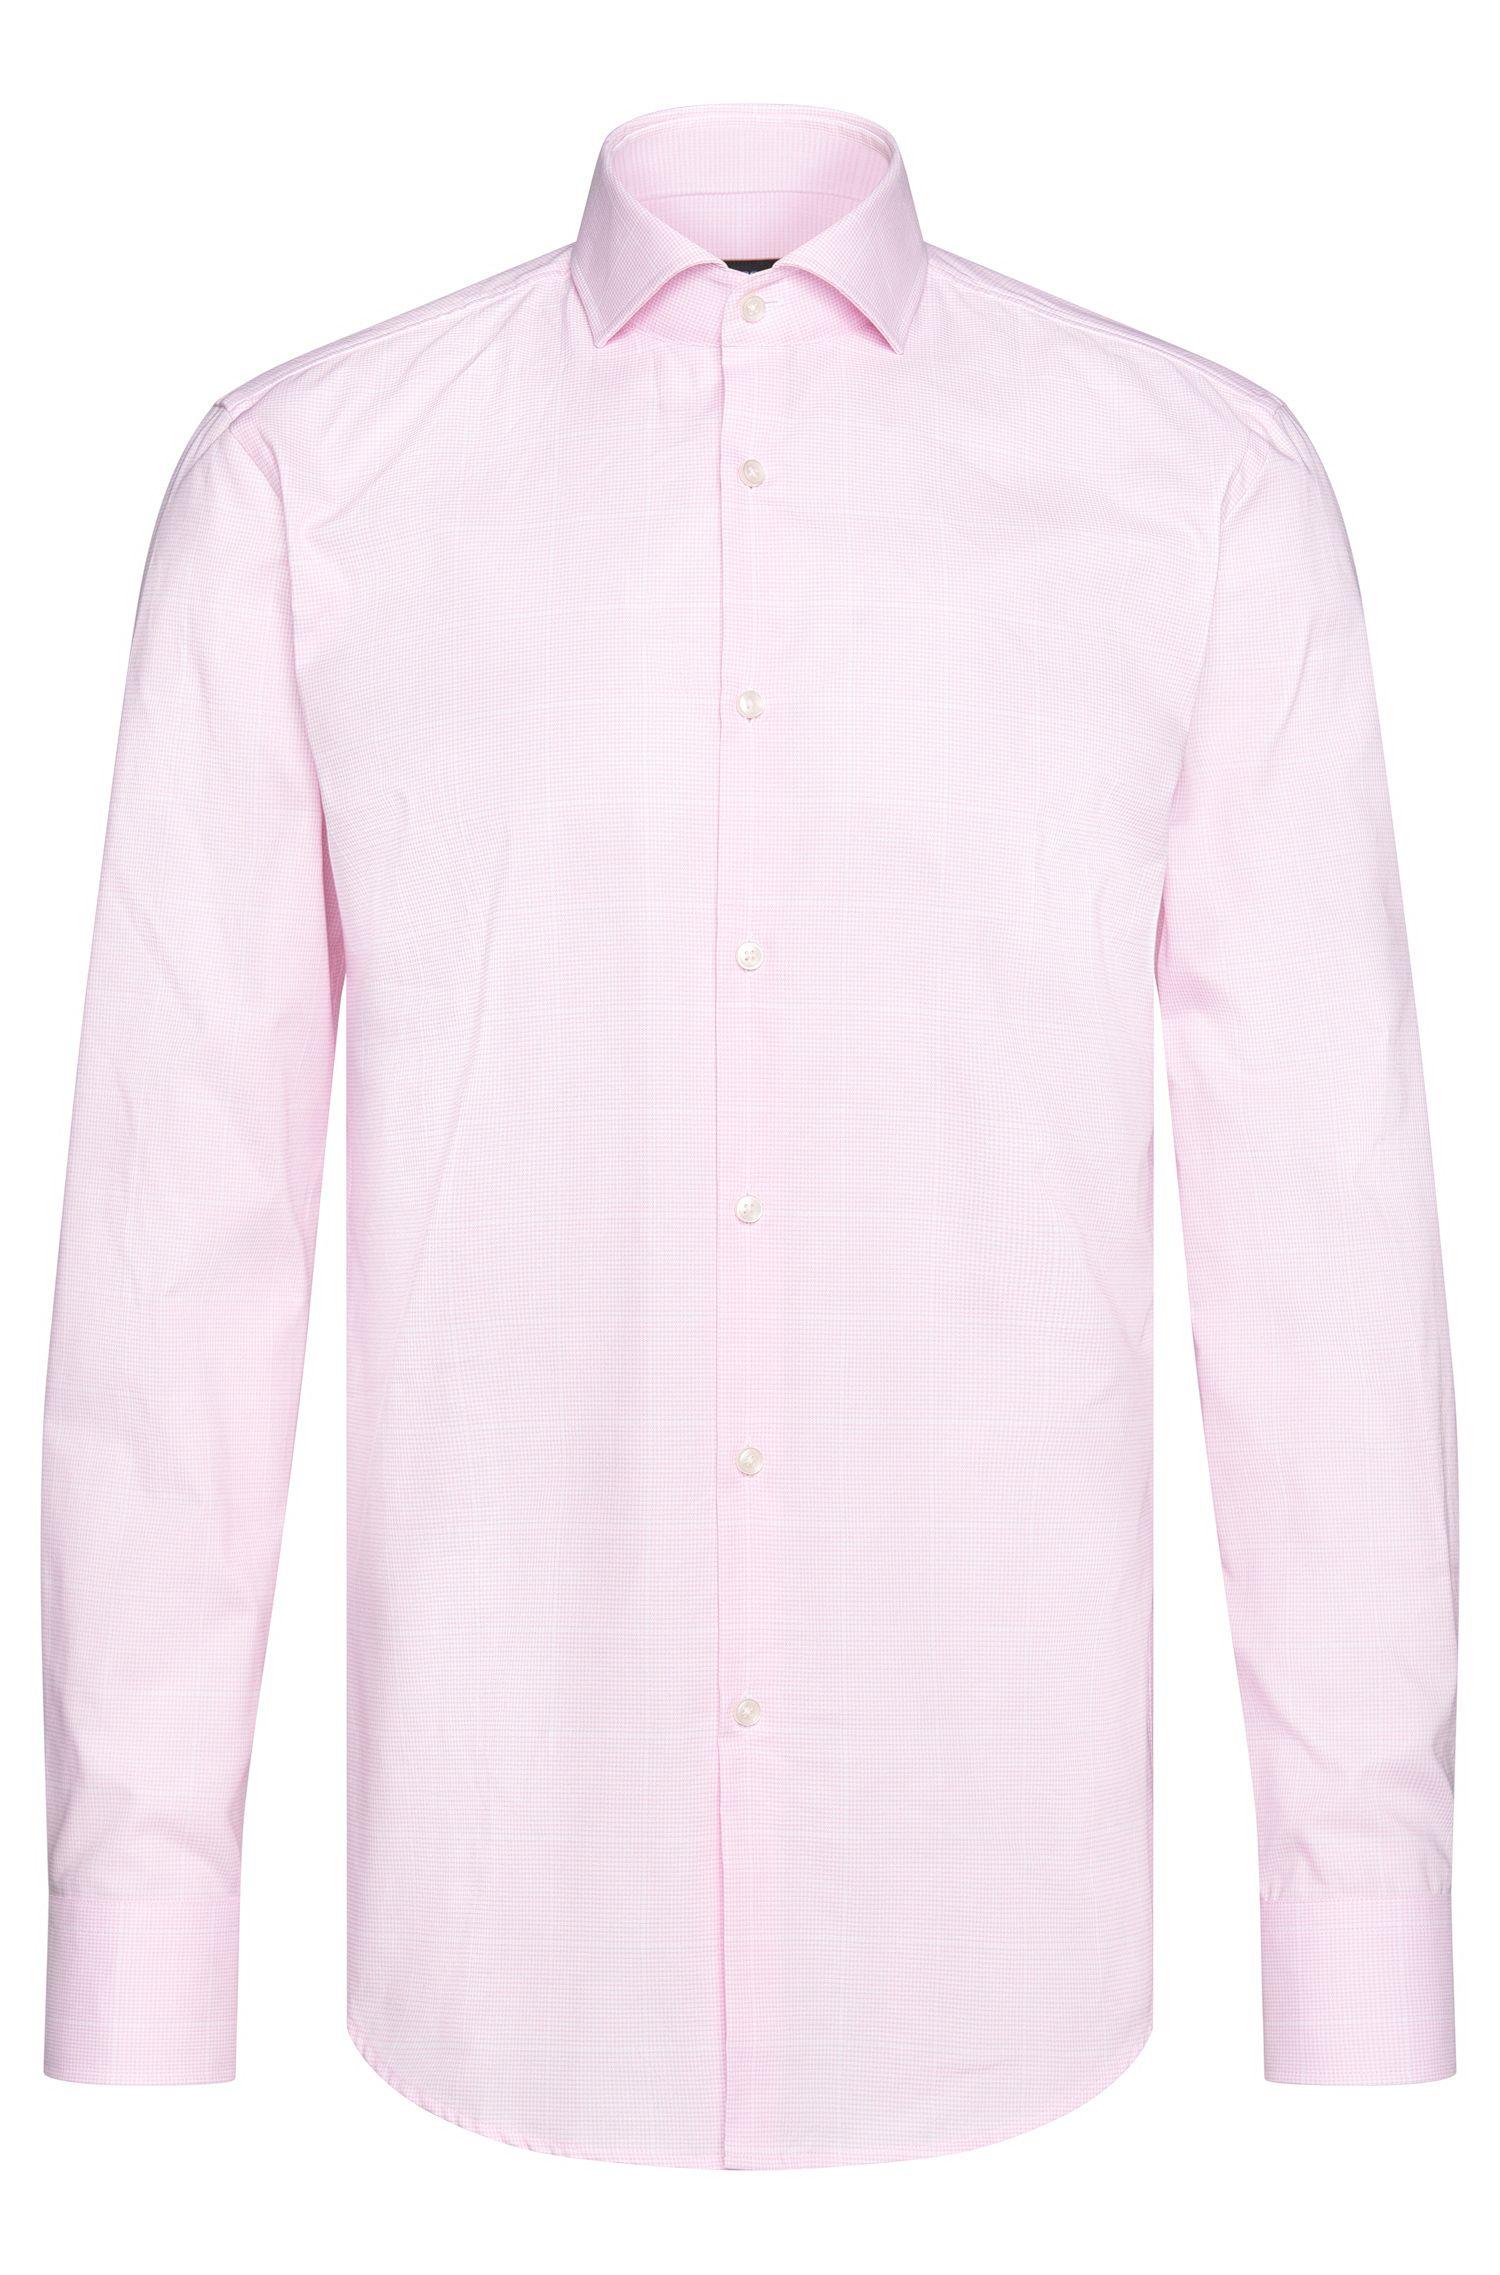 Houndstooth Cotton Dress Shirt, Slim Fit| Jason, light pink